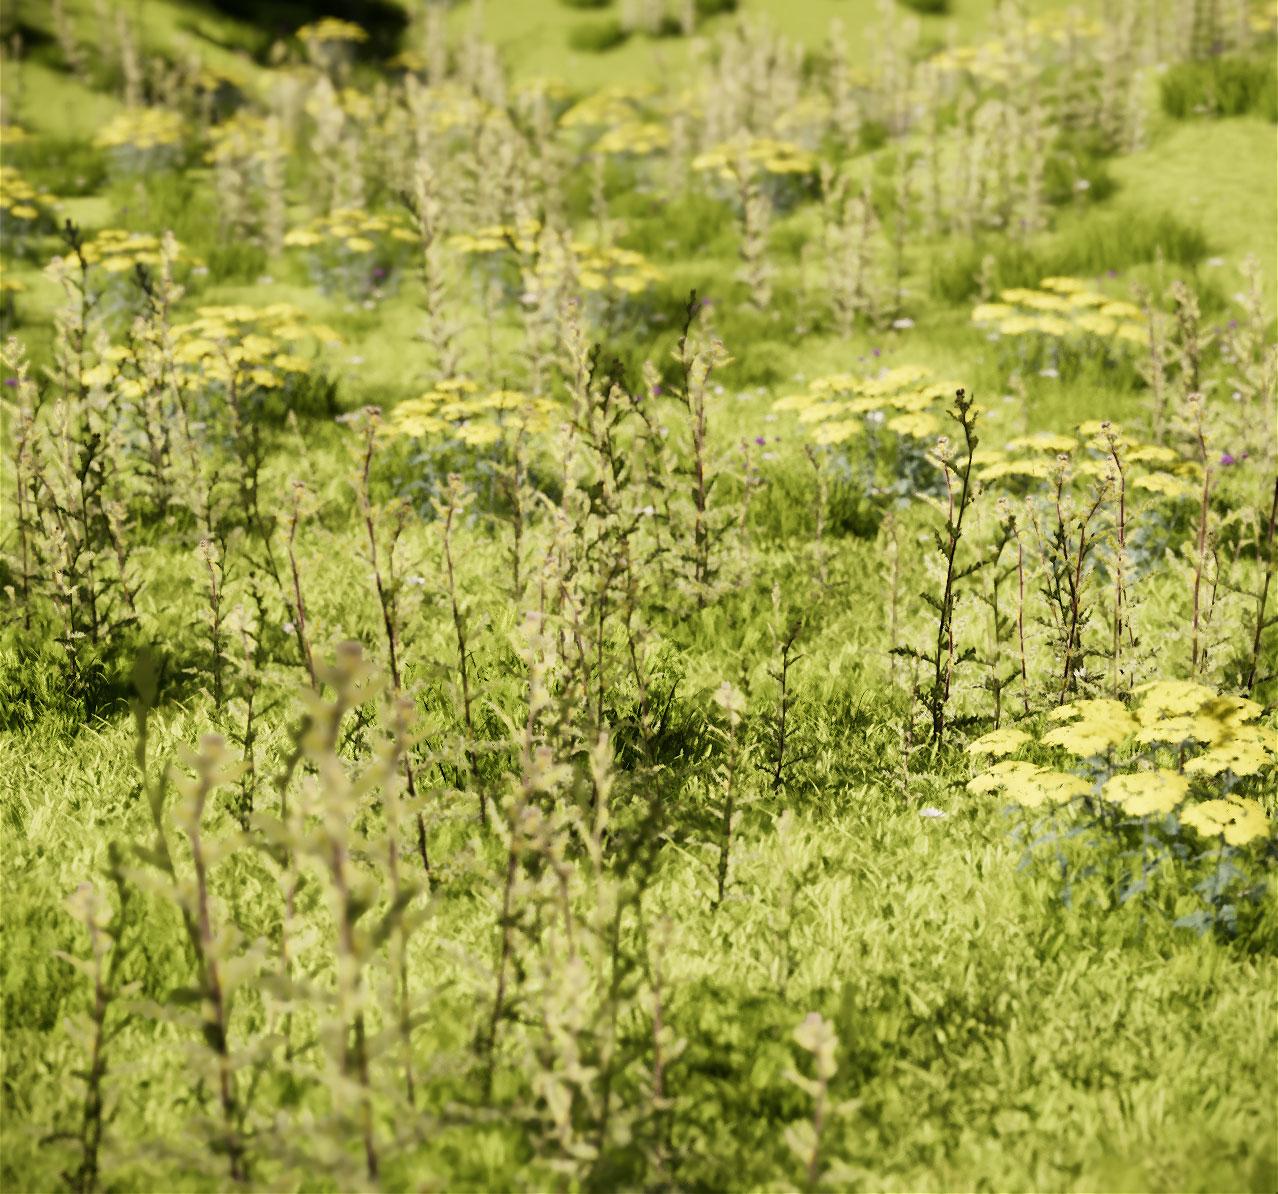 Perspective-paysage-architecure-prairie fleurie-illustration-3D.jpg